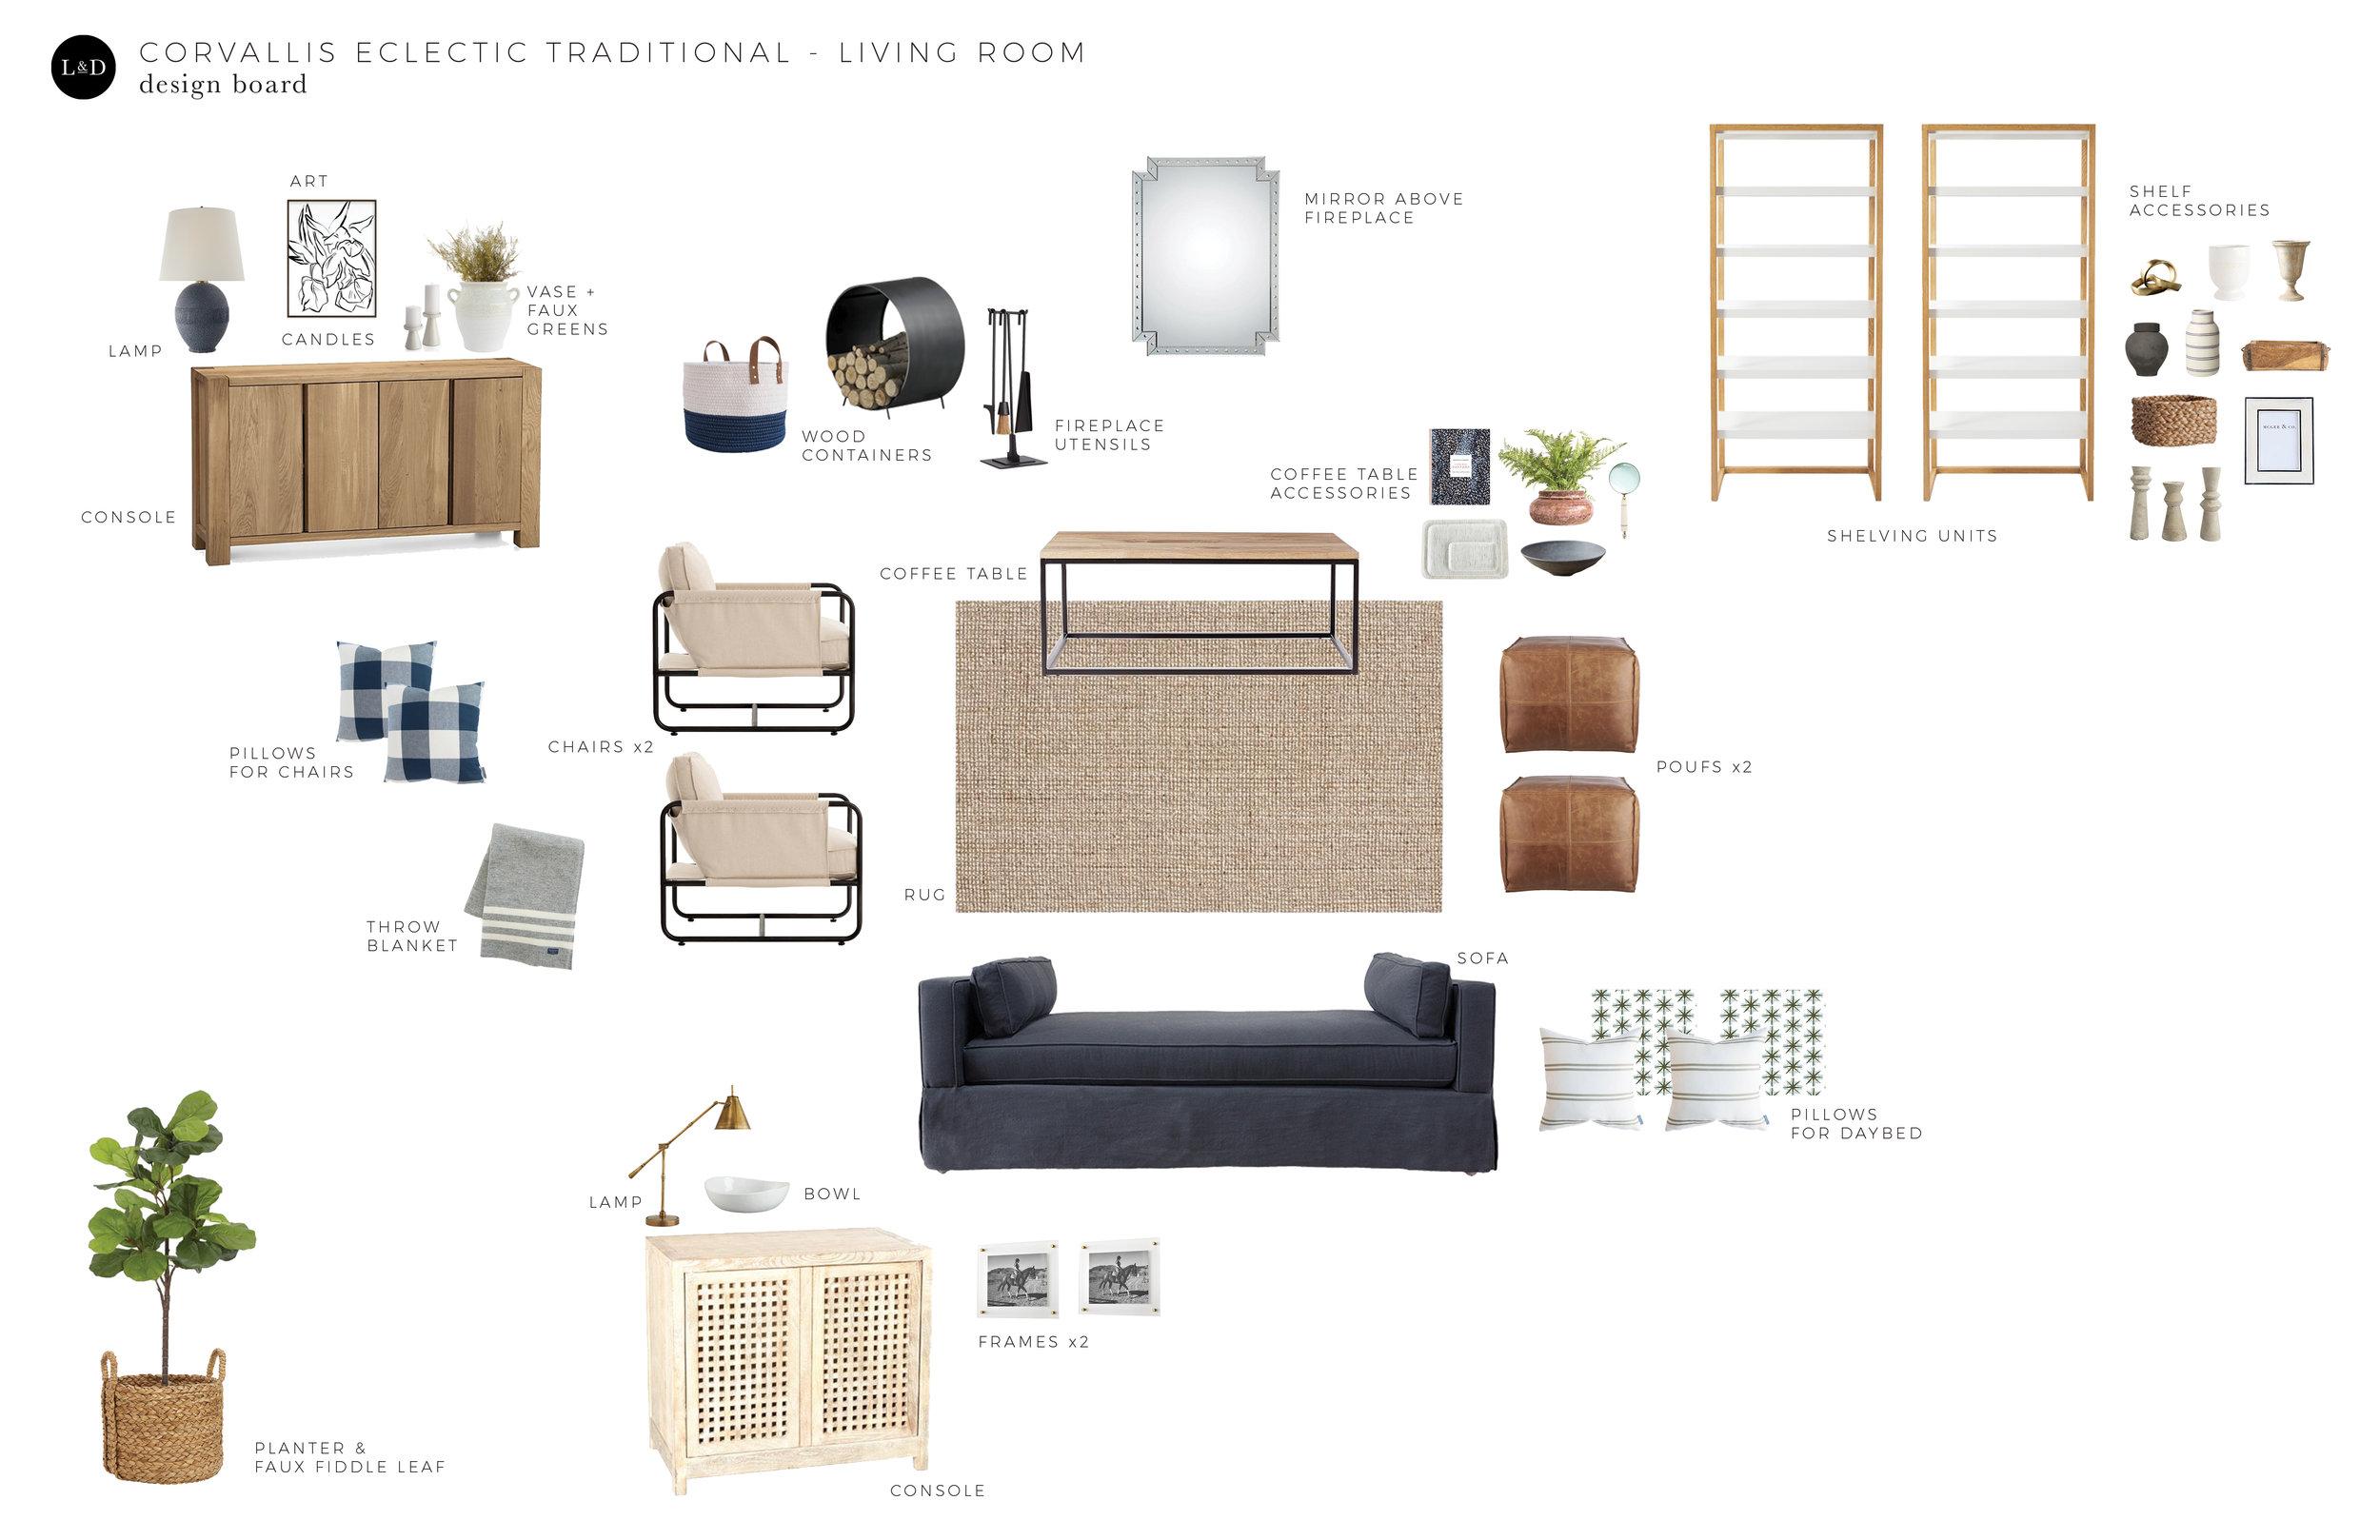 L+D_Corvallis_Eclectic_Traditional_livingroom.jpg